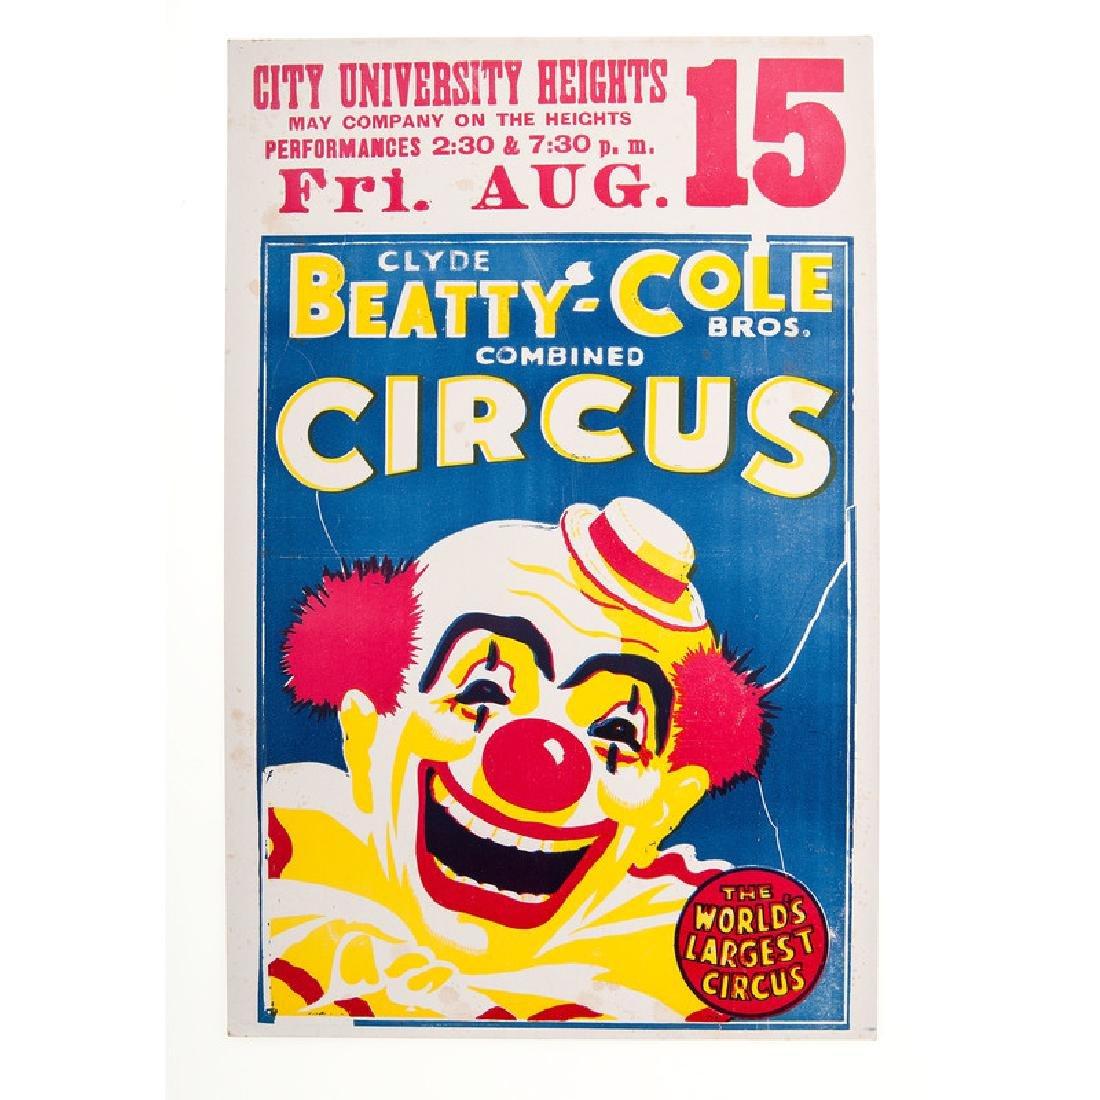 American Circus Posters - 5